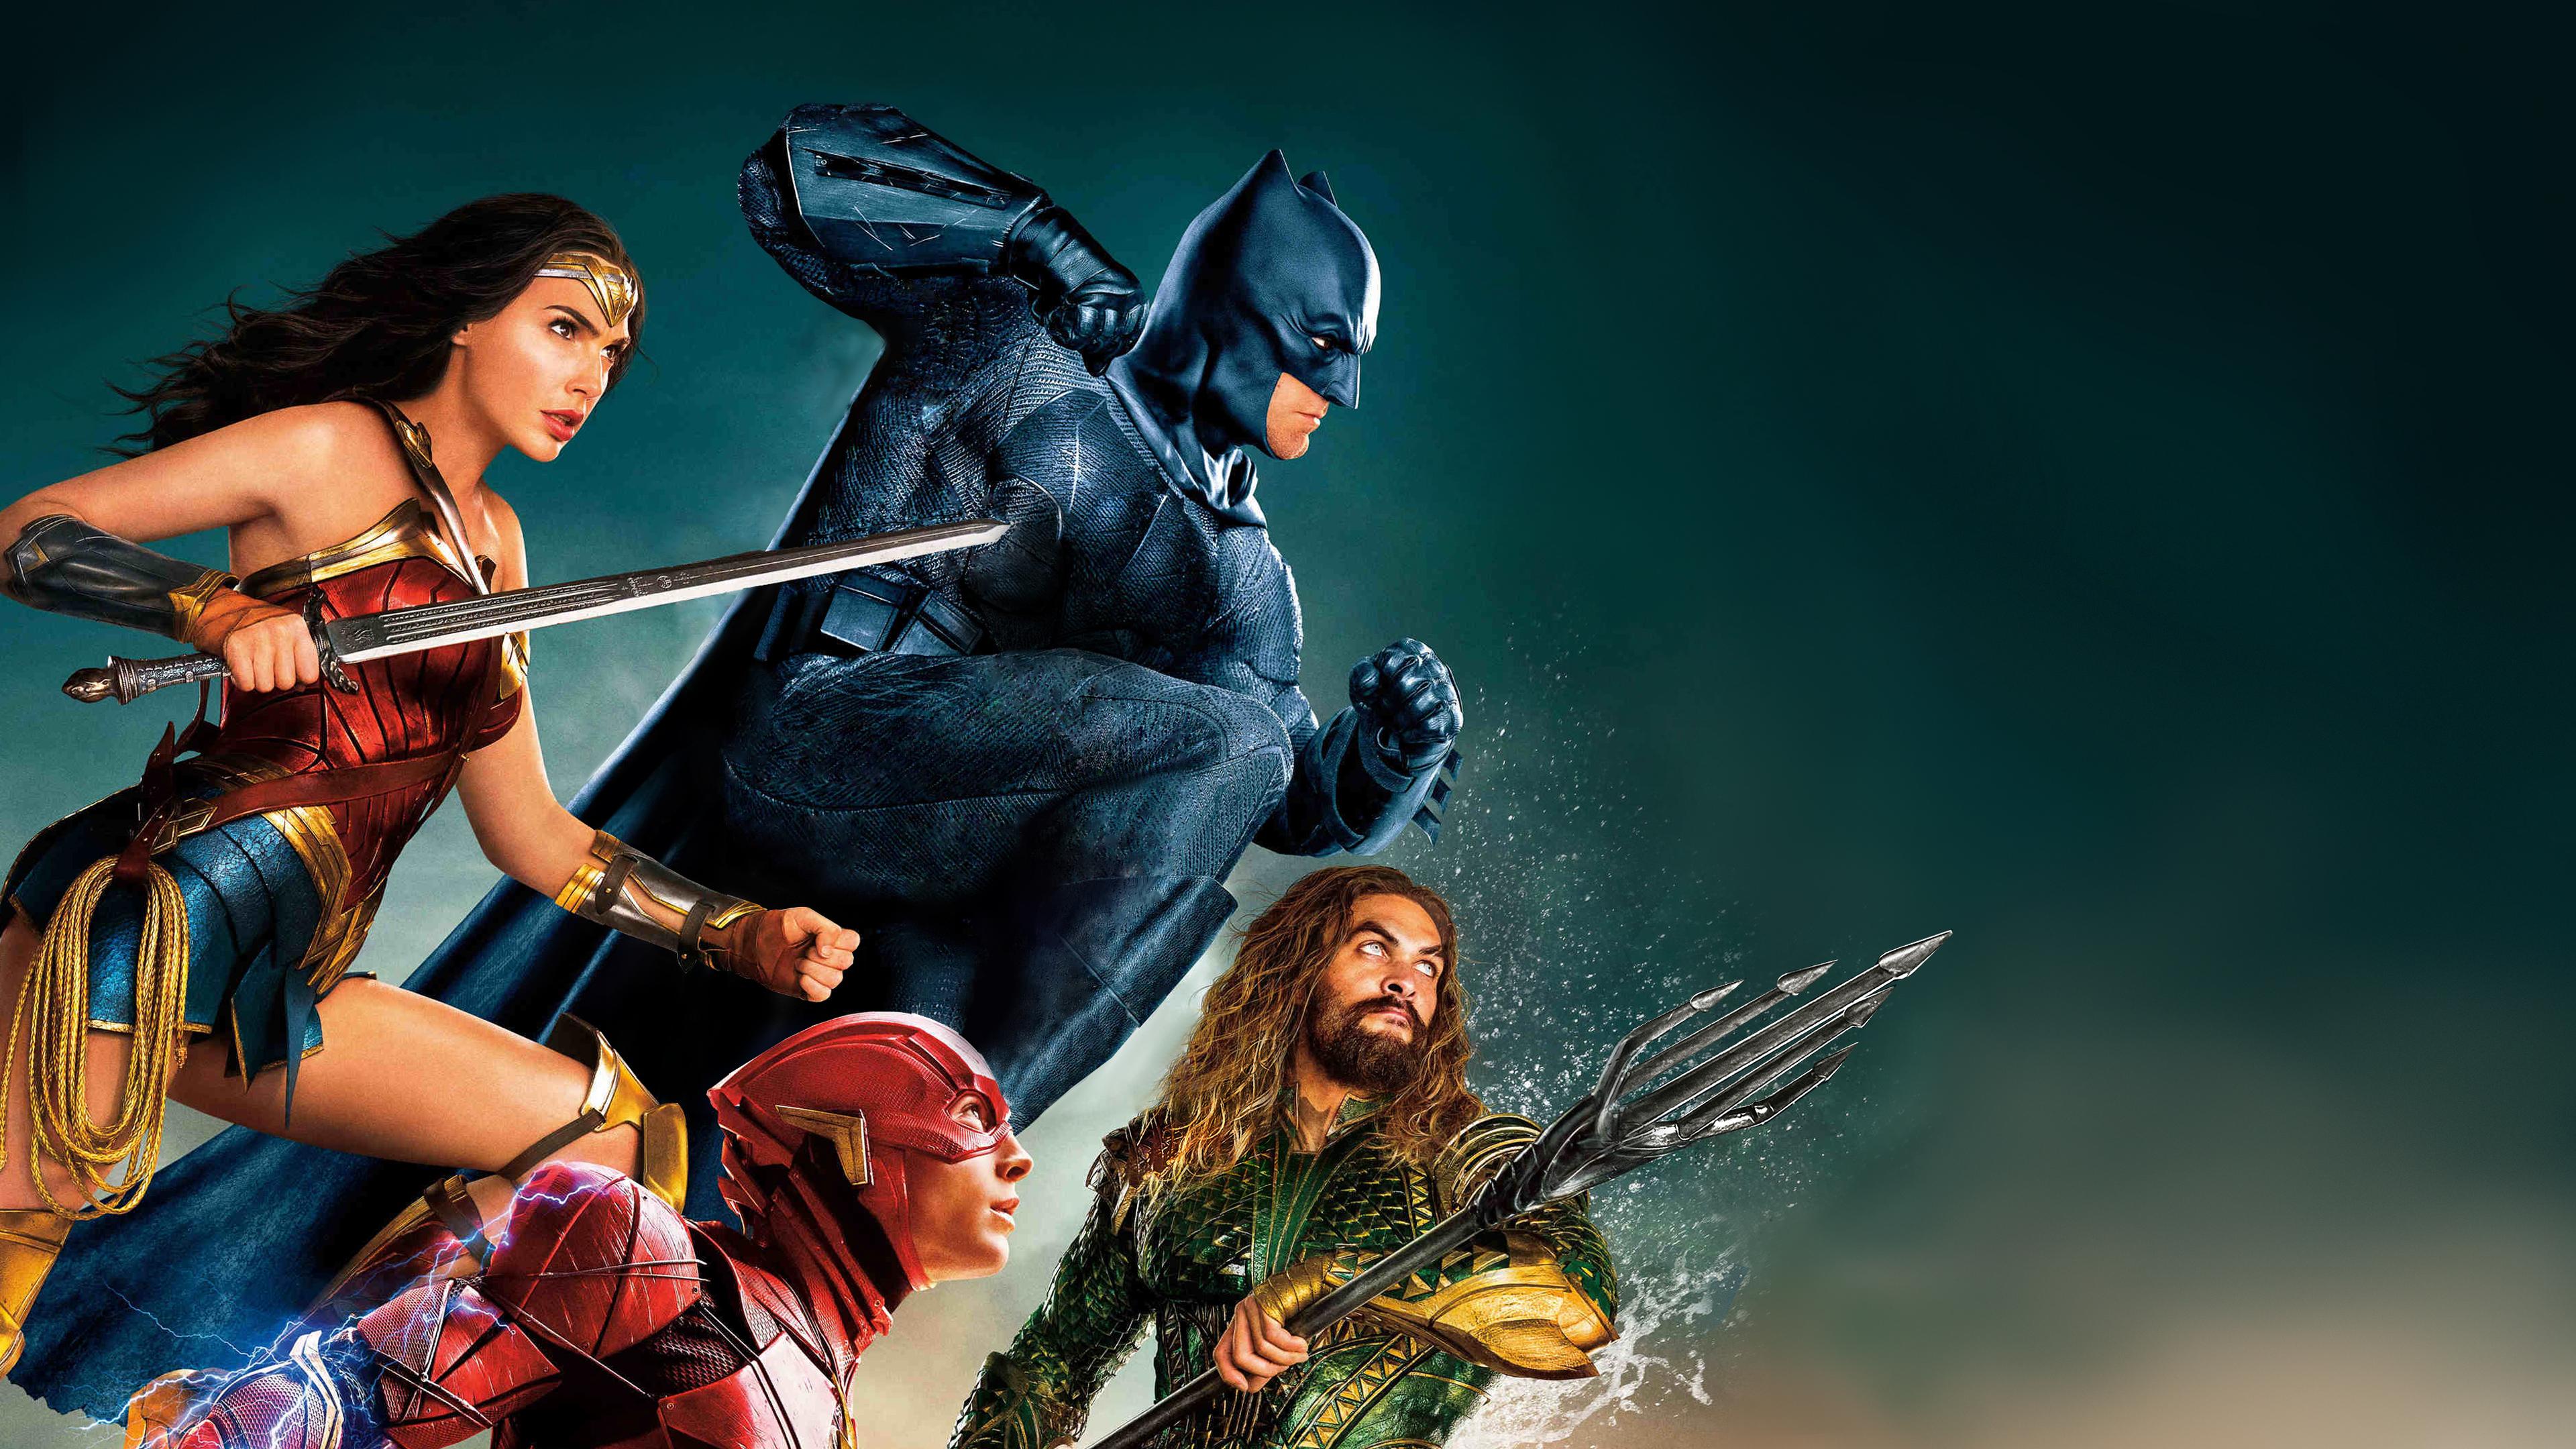 Justice league, movie, superheroes, 3840x2400 wallpaper